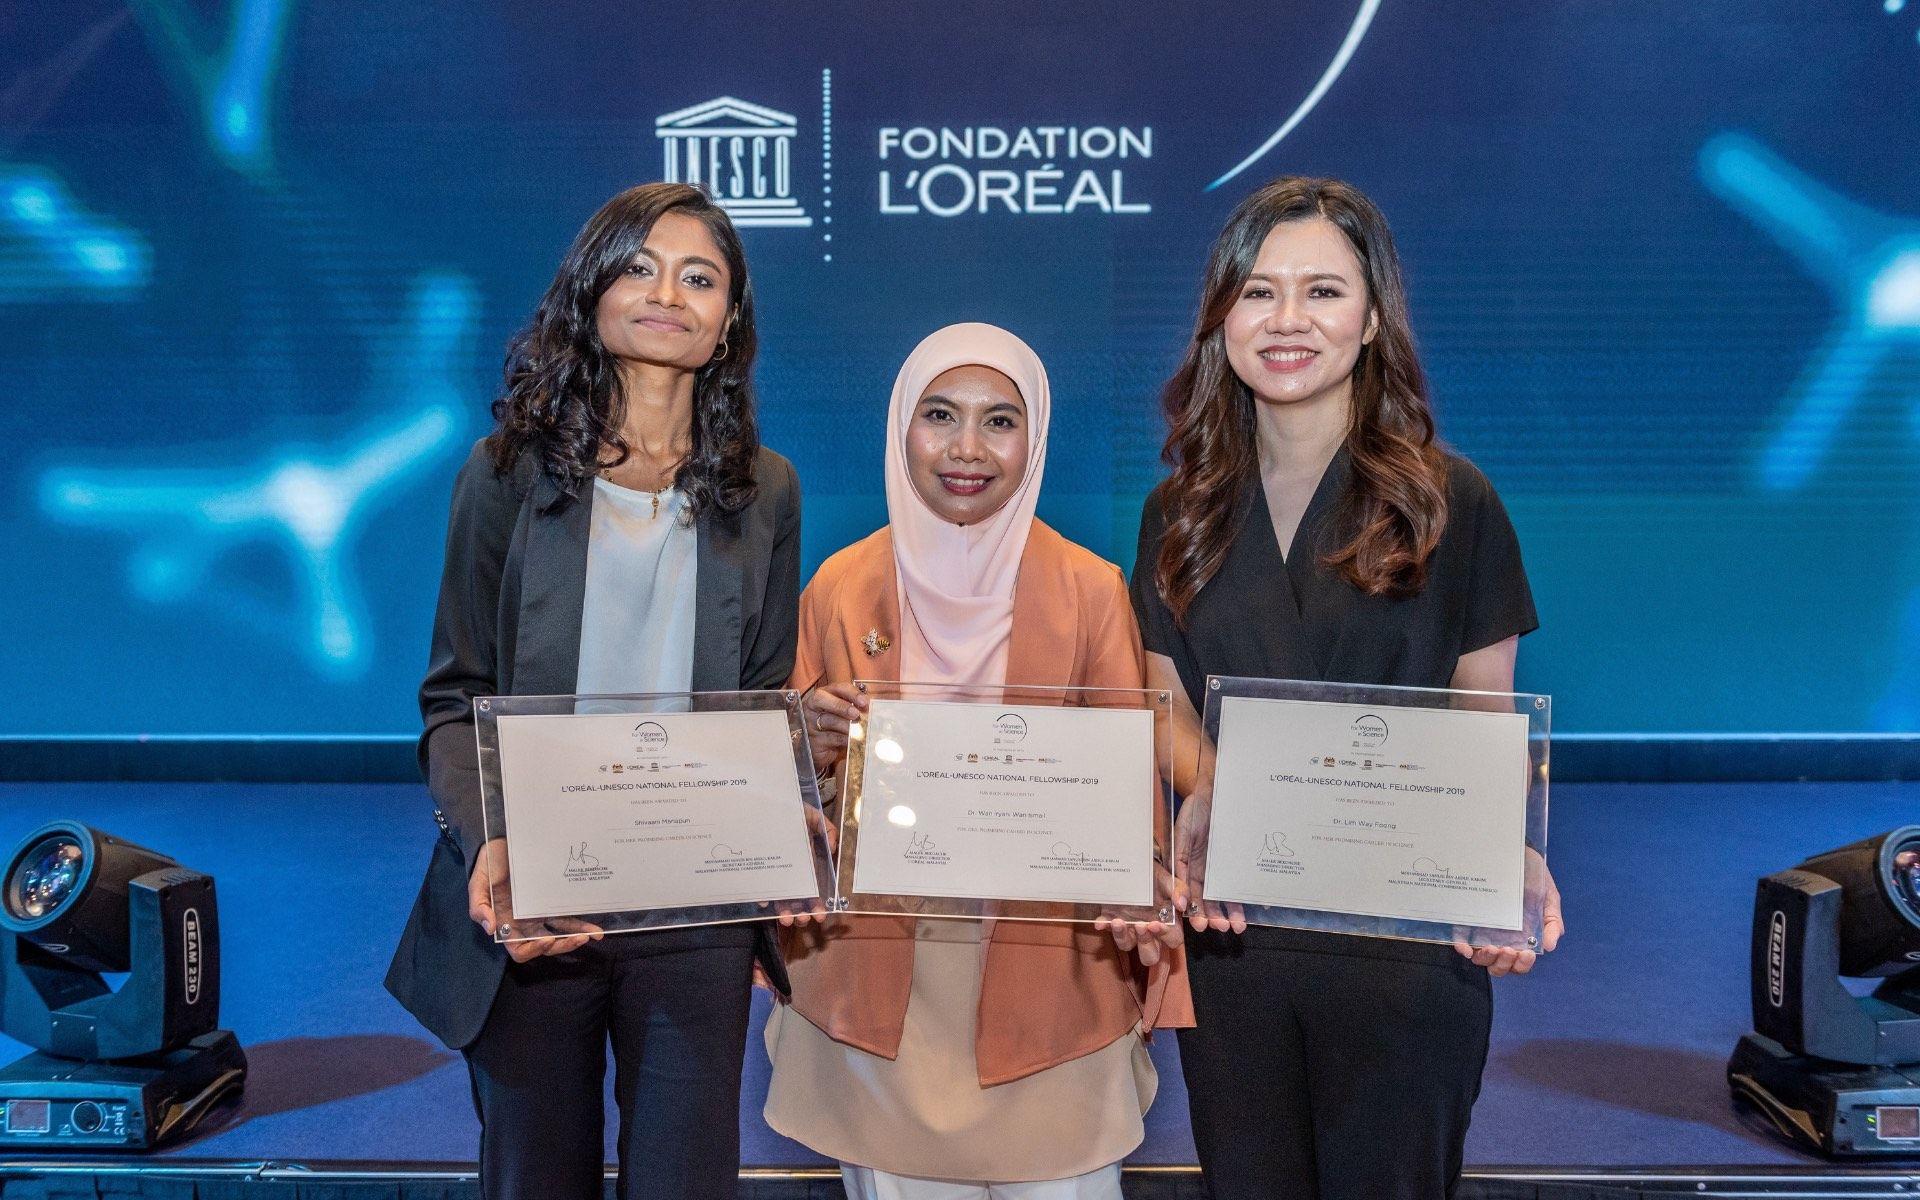 Shivaani Mariapun, Dr Wan Iryani Wan Ismail and Dr Lim Way Foong